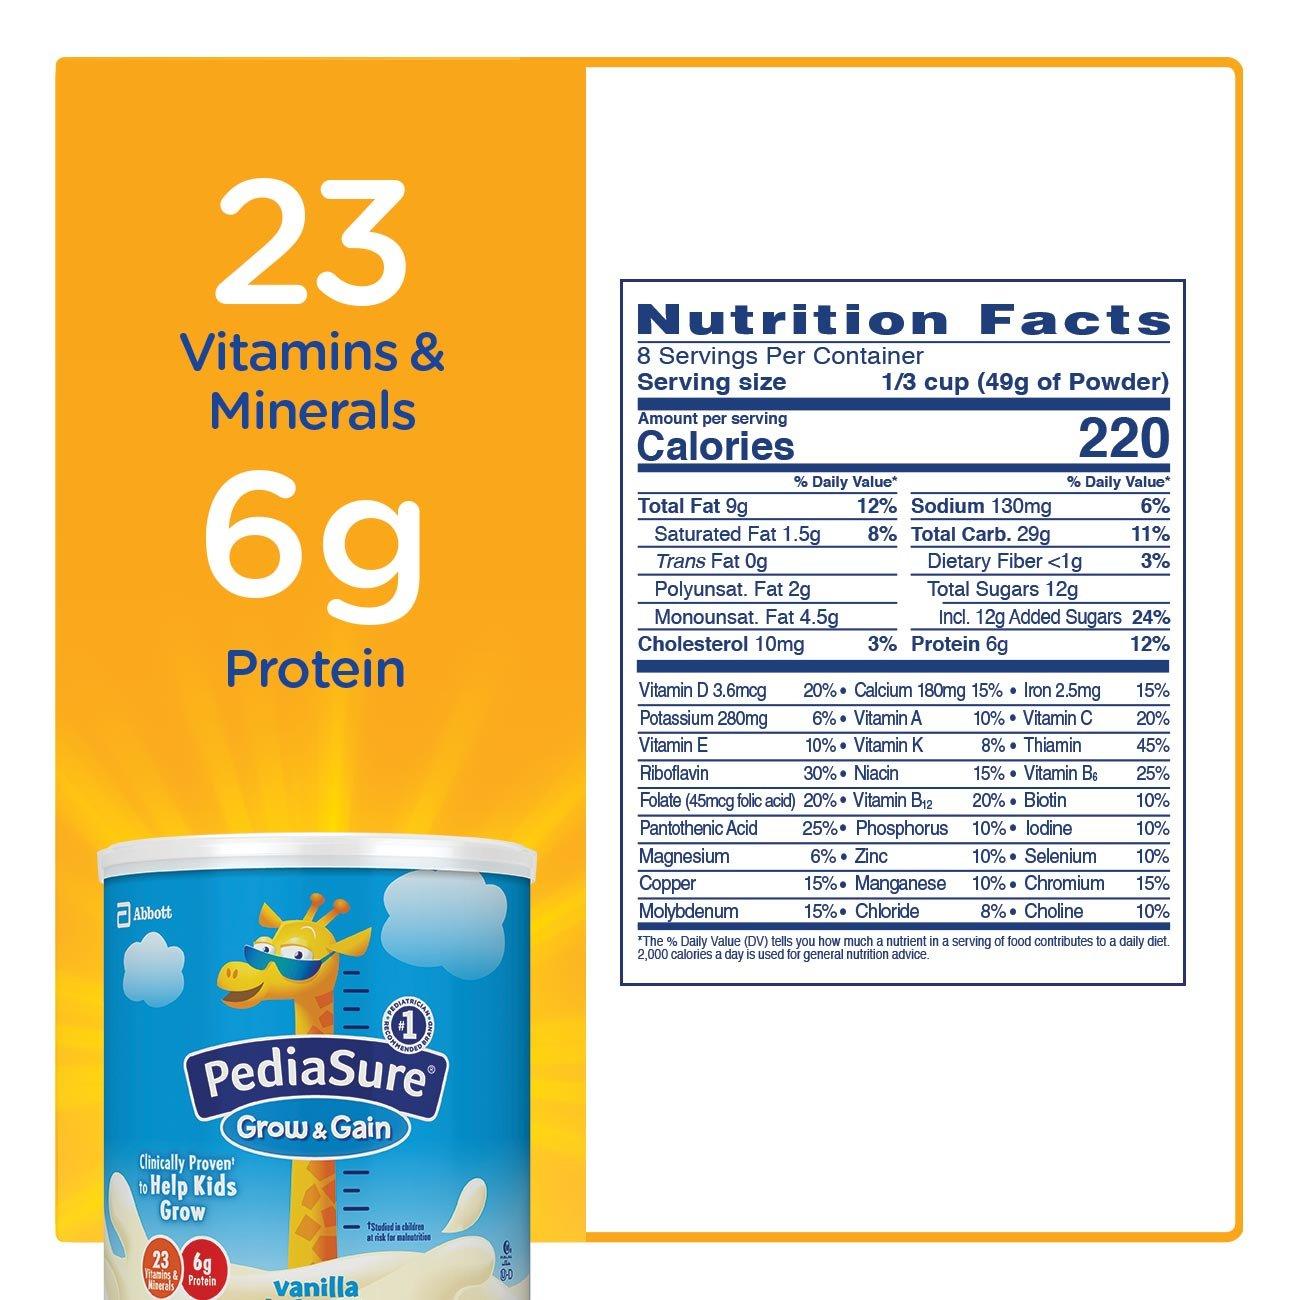 PediaSure Grow & Gain Non-GMO Vanilla Shake Mix Powder, Nutrition Shake for Kids, 14.1 oz, 3 Count by Pediasure (Image #5)